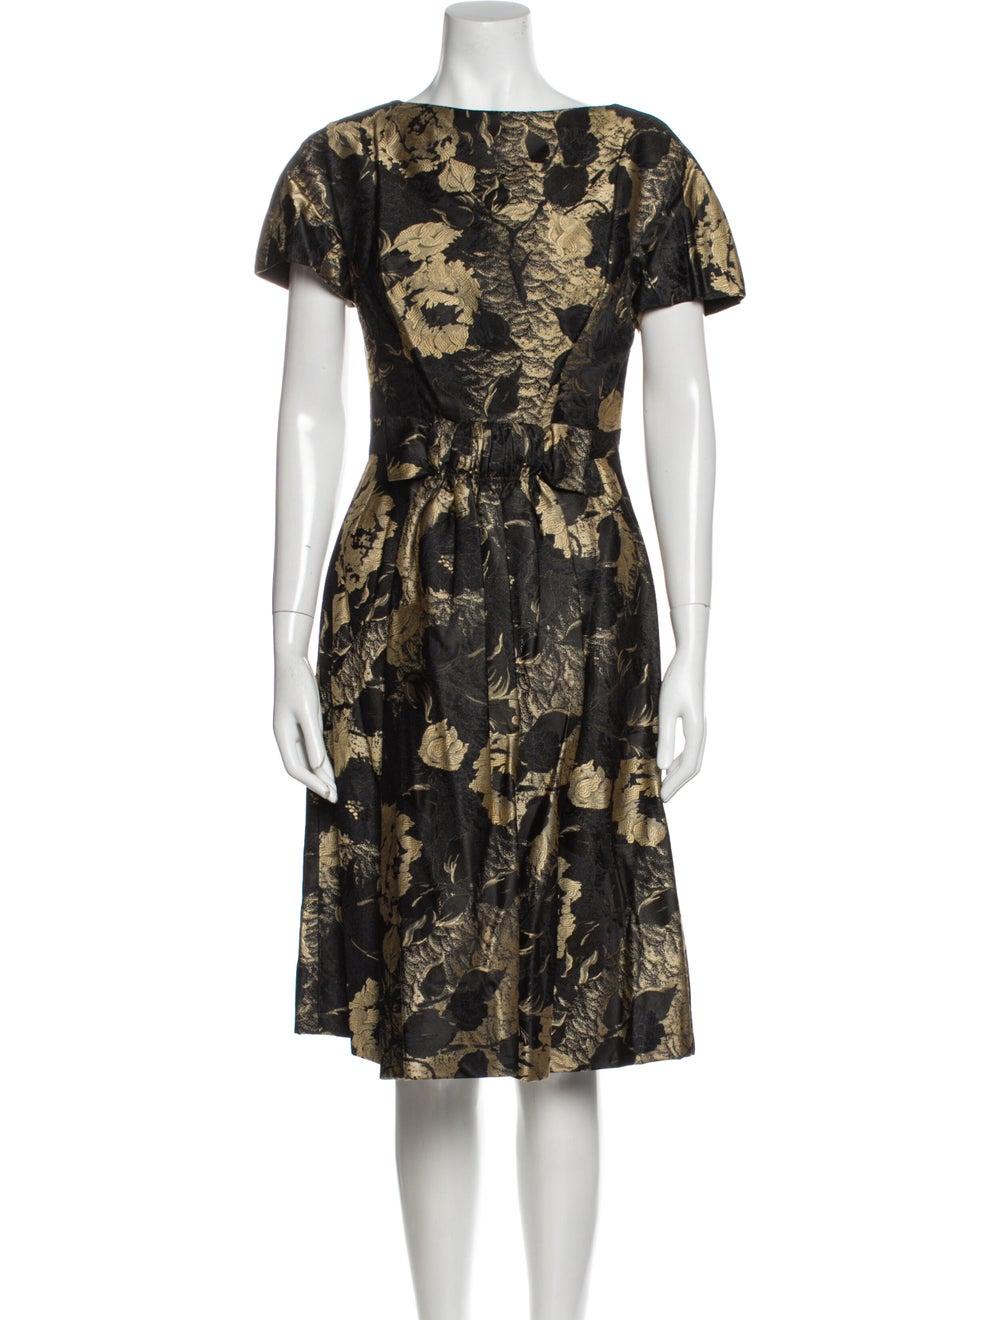 Arnold Scaasi Vintage Knee-Length Dress Black - image 4